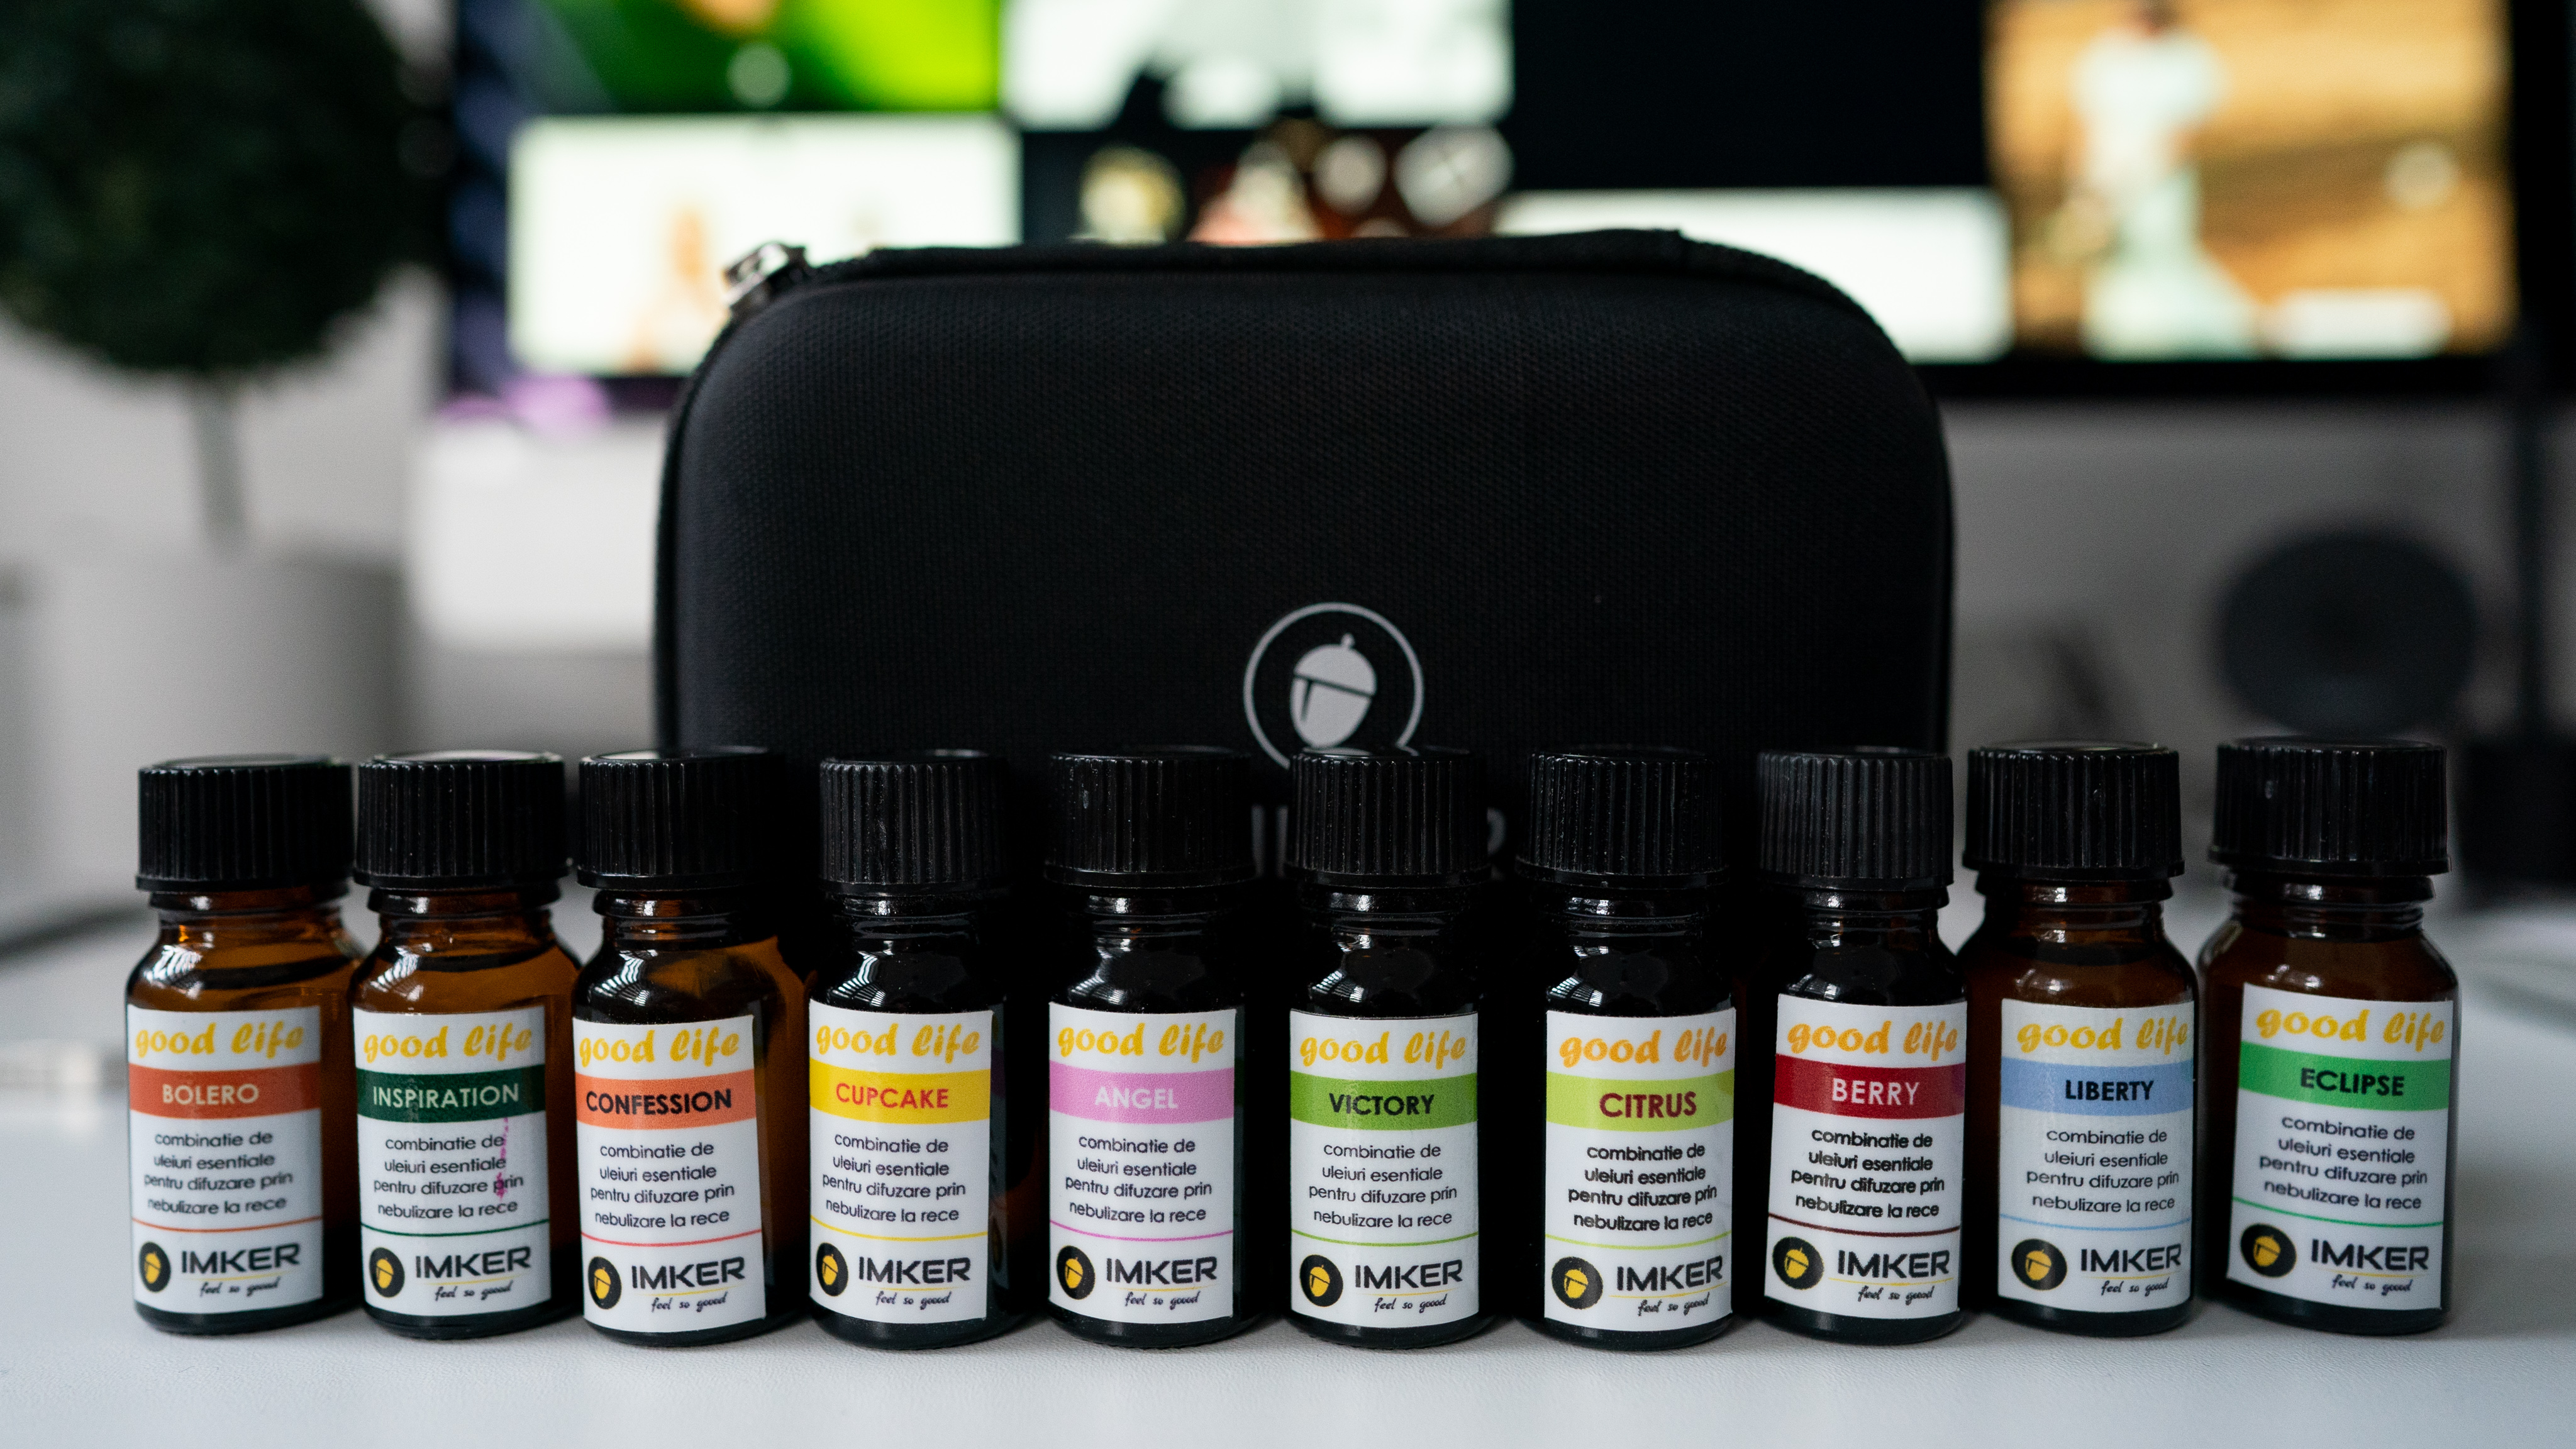 parfumuri uleiuri esentiale imker aromaterapie